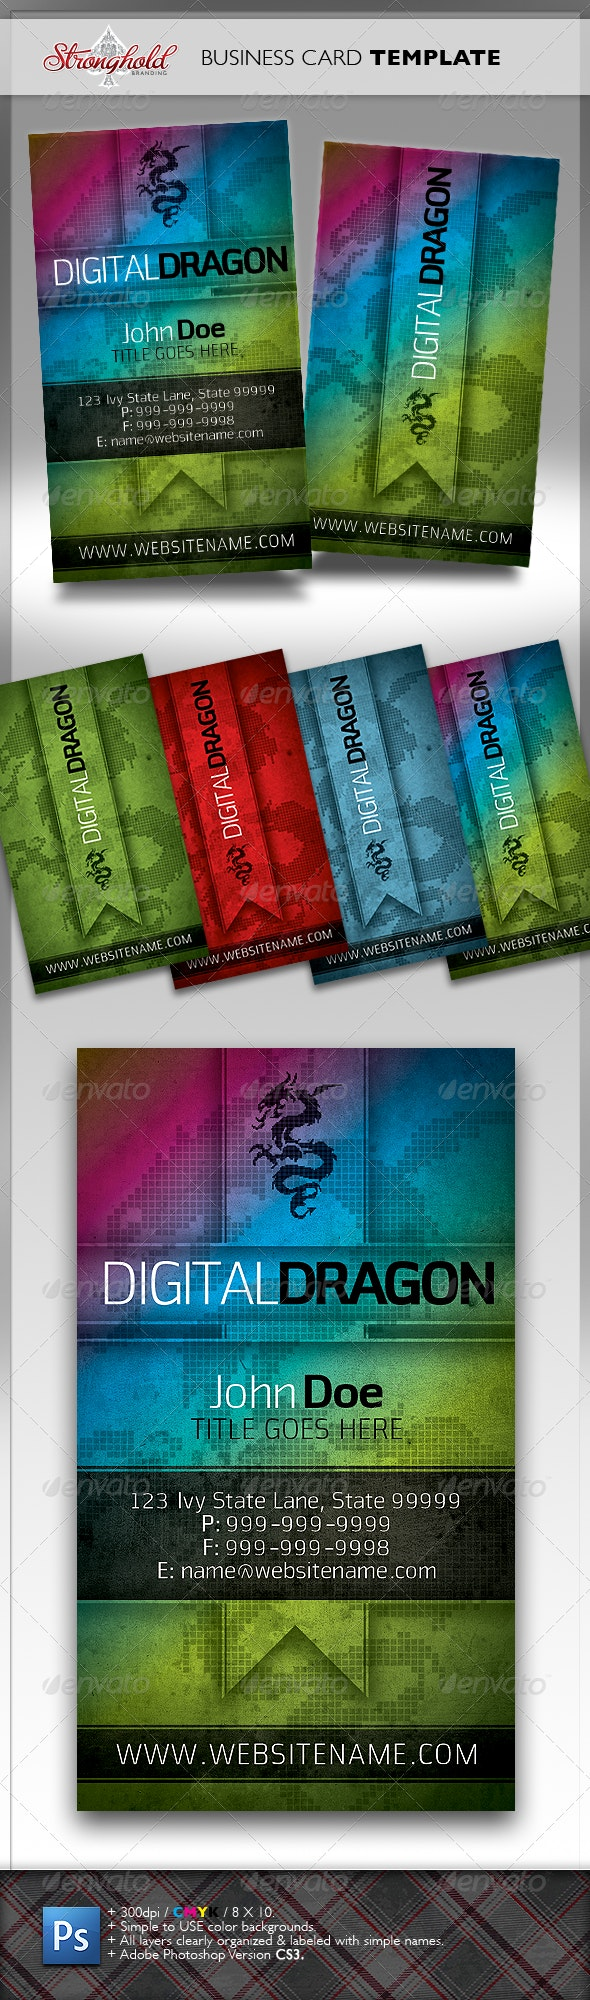 Digital Dragon Business Card Template - Creative Business Cards